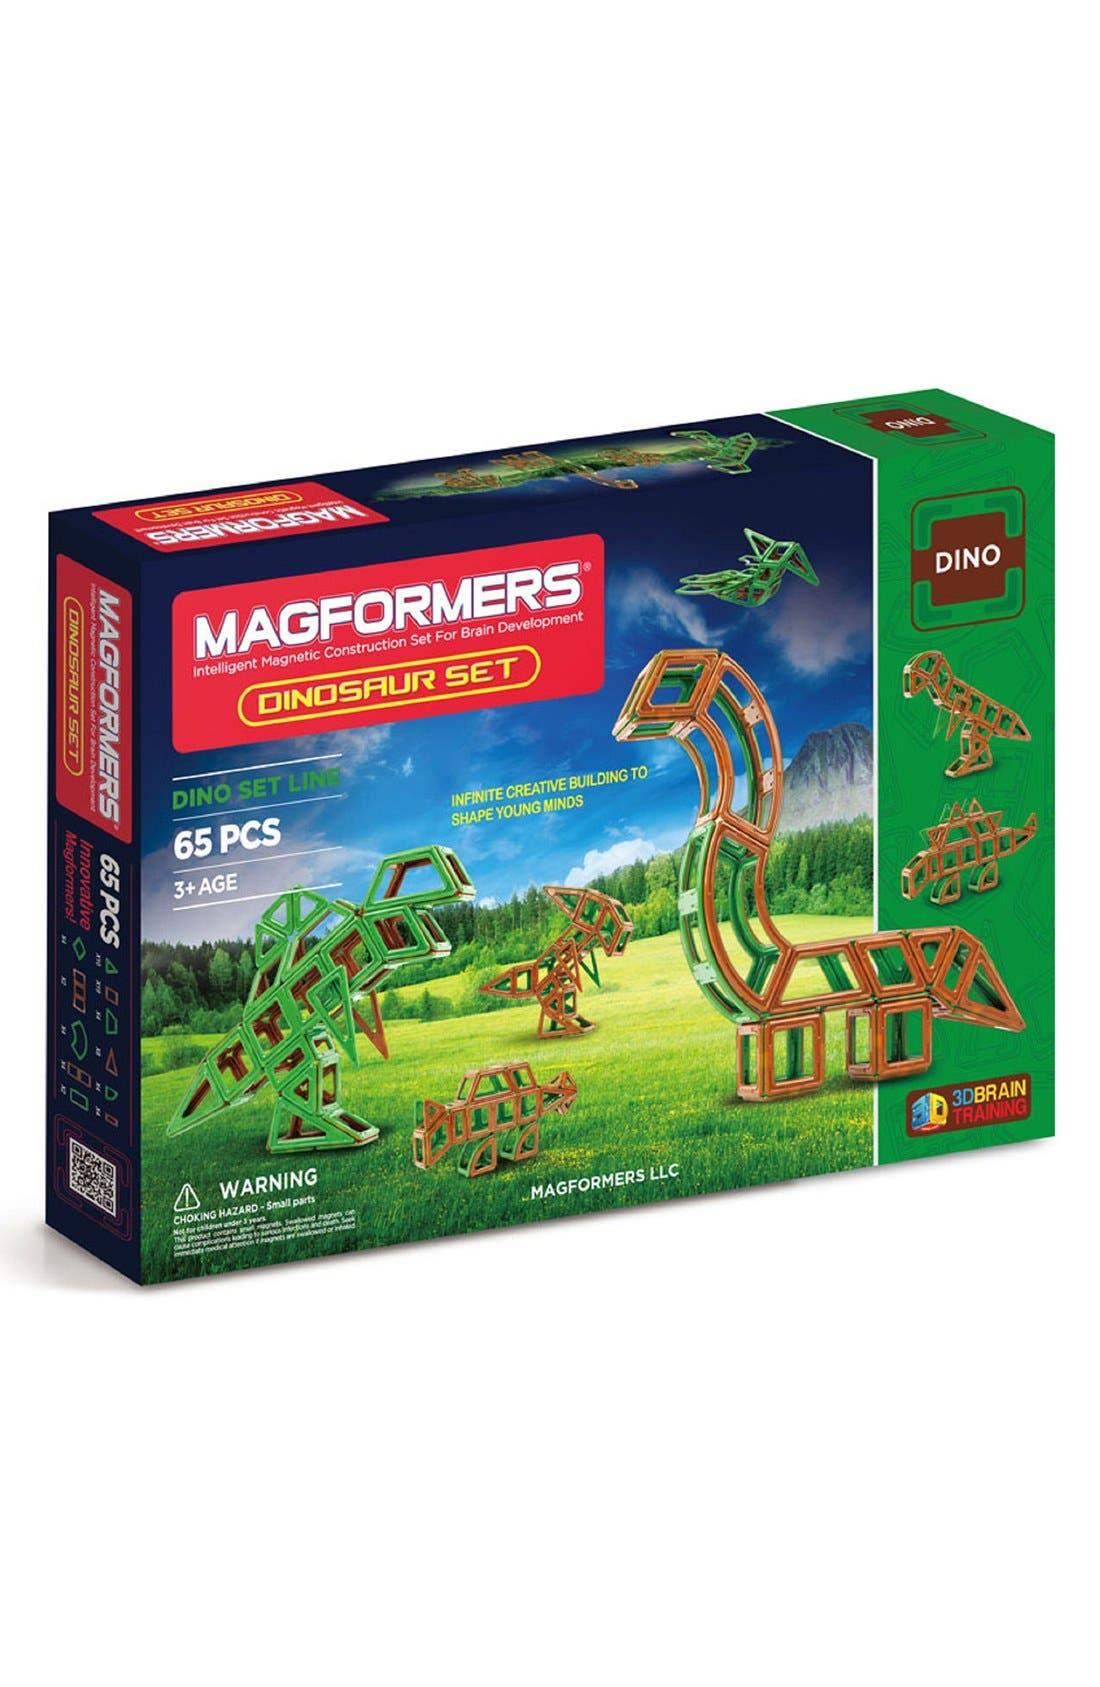 'Dinosaur' Magnetic Construction Set,                             Main thumbnail 1, color,                             300